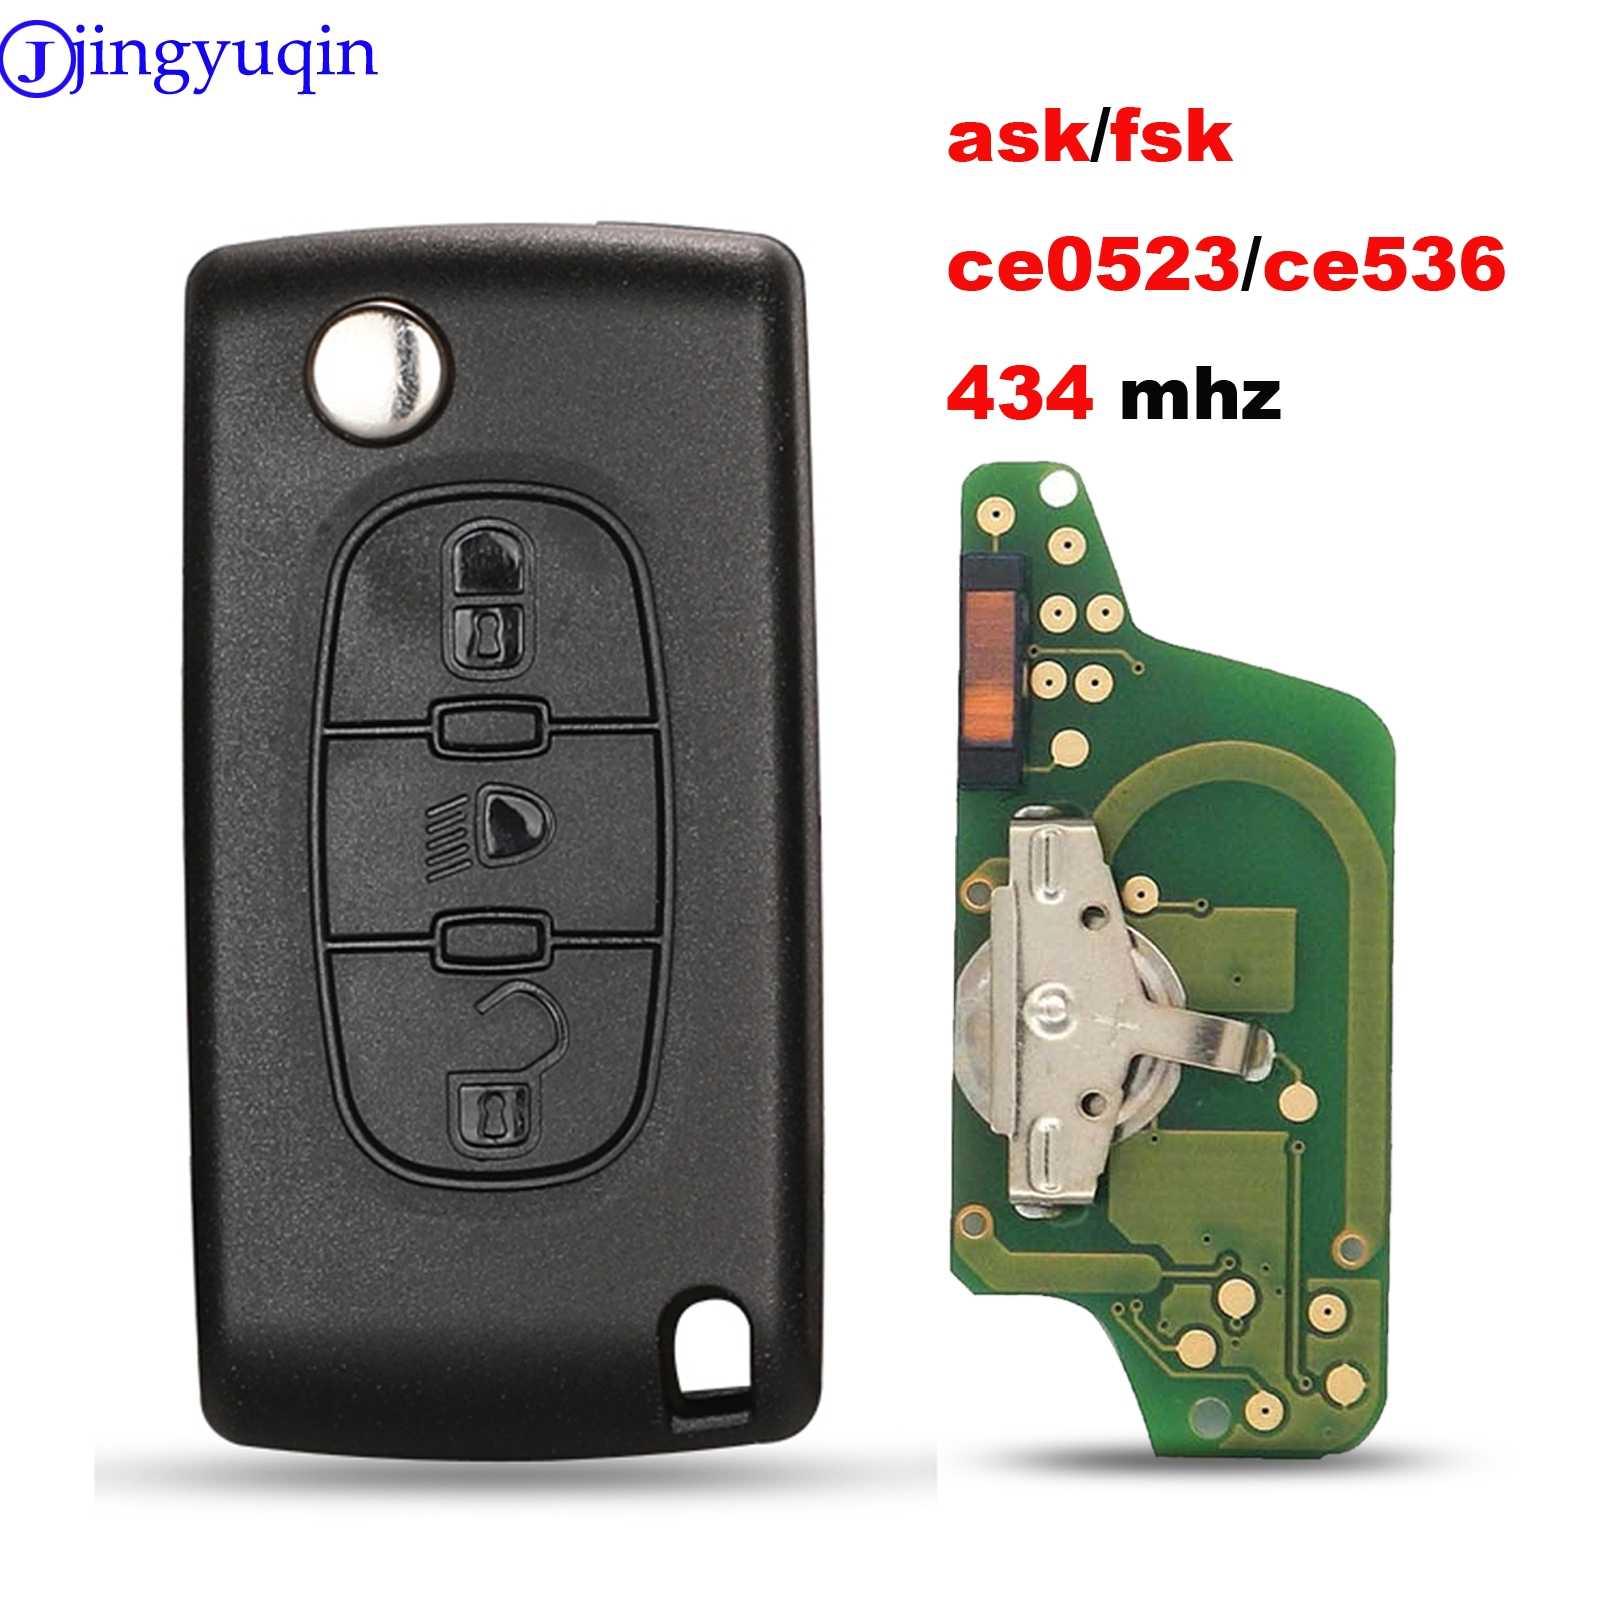 Jingyuqin Ce0523 Ce0536/fsk 433mhz ID46 プジョー 407 307 308 607 シトロエンC2 C3 C4 c5 C6 C8 車のキーVA2/HU83 刃